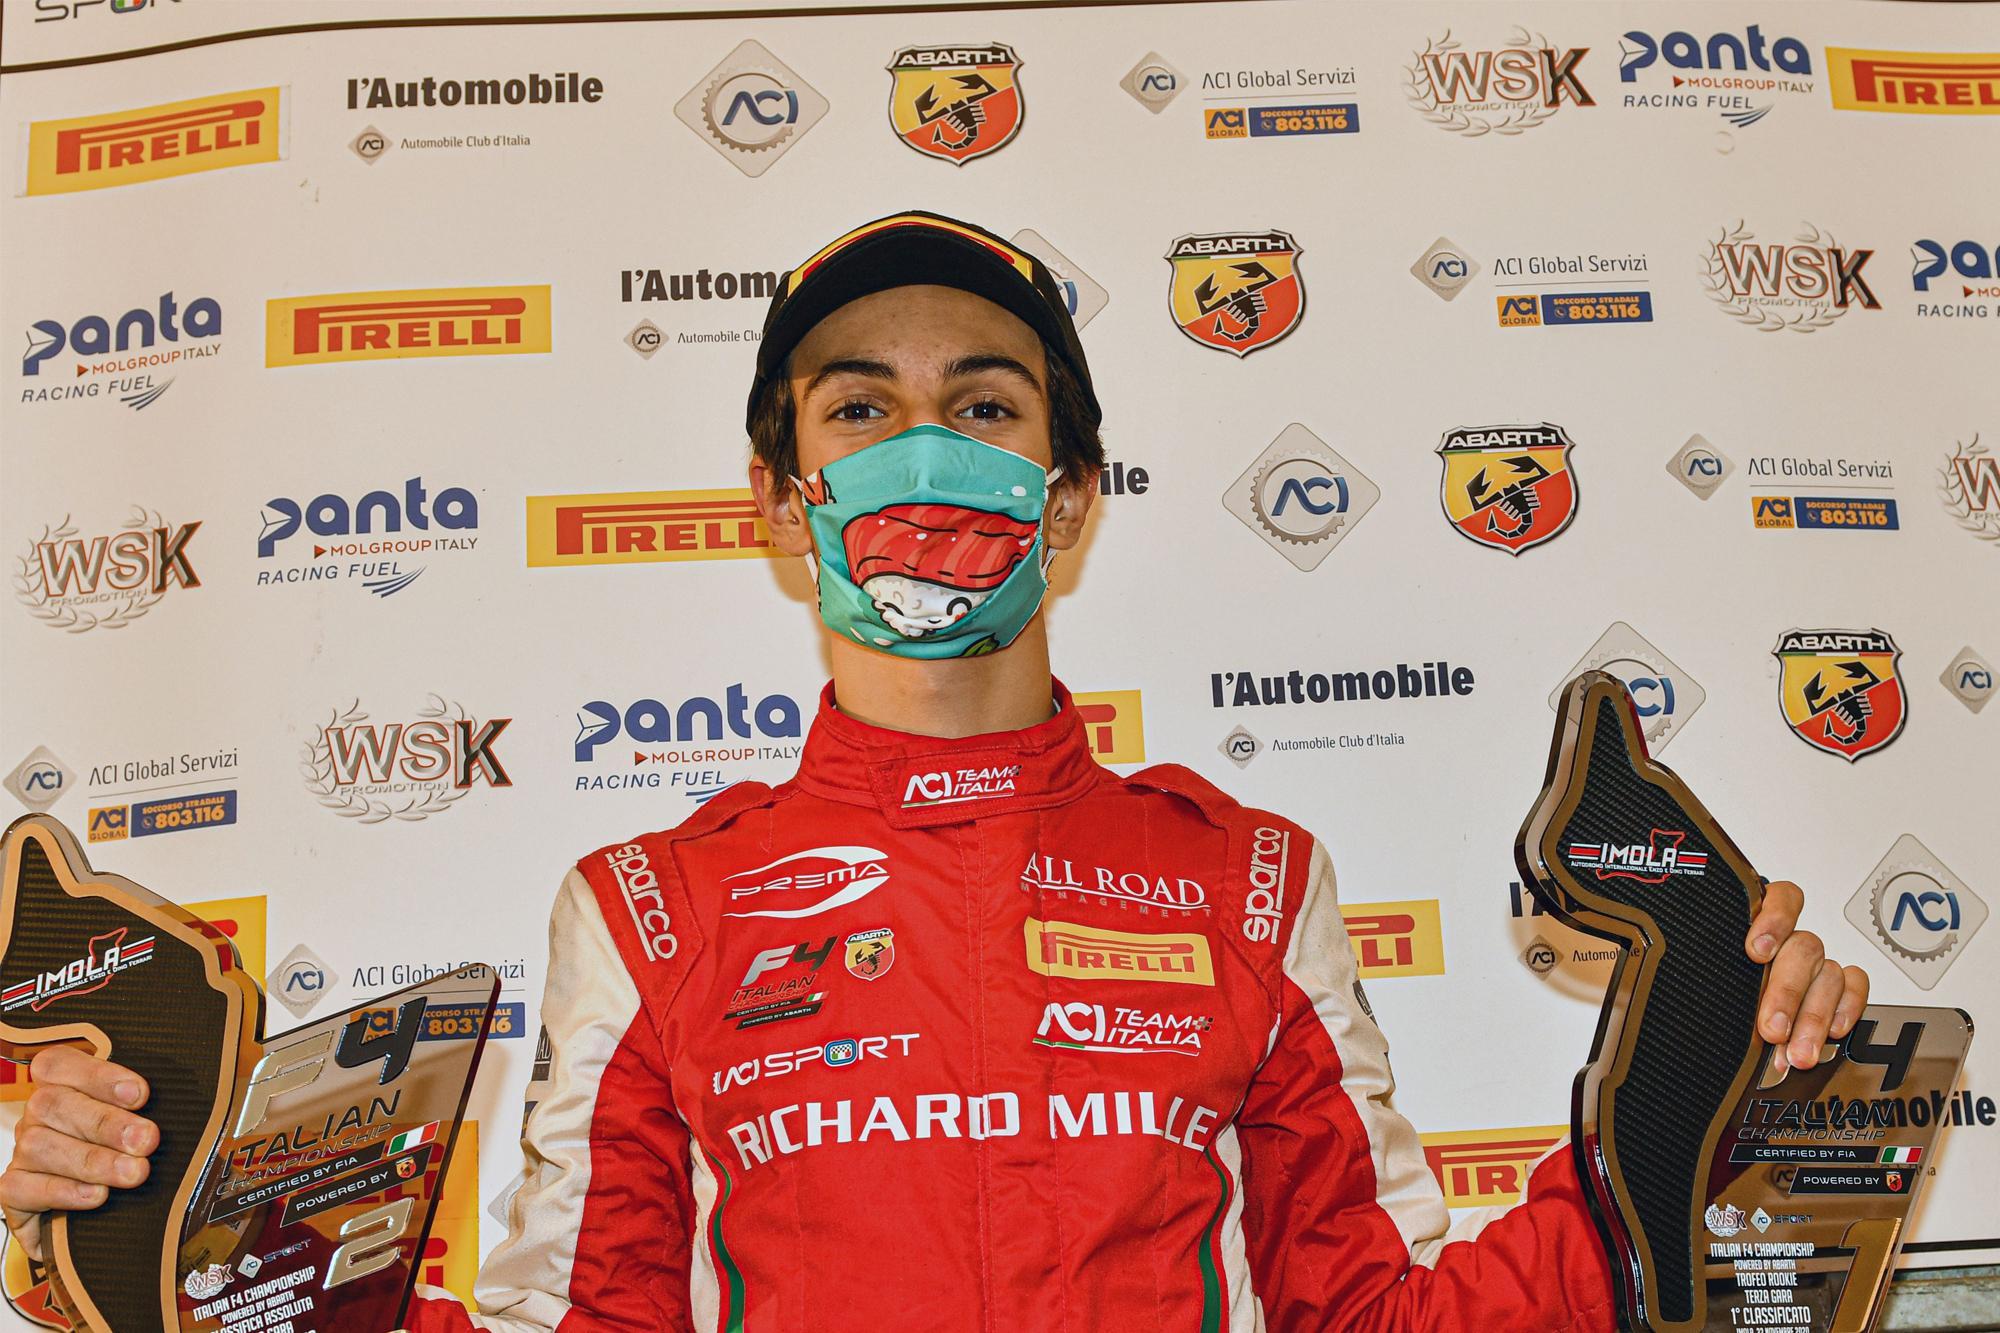 O Πρωταθλητής Gabriele Minì, εξιστορεί την πορεία του